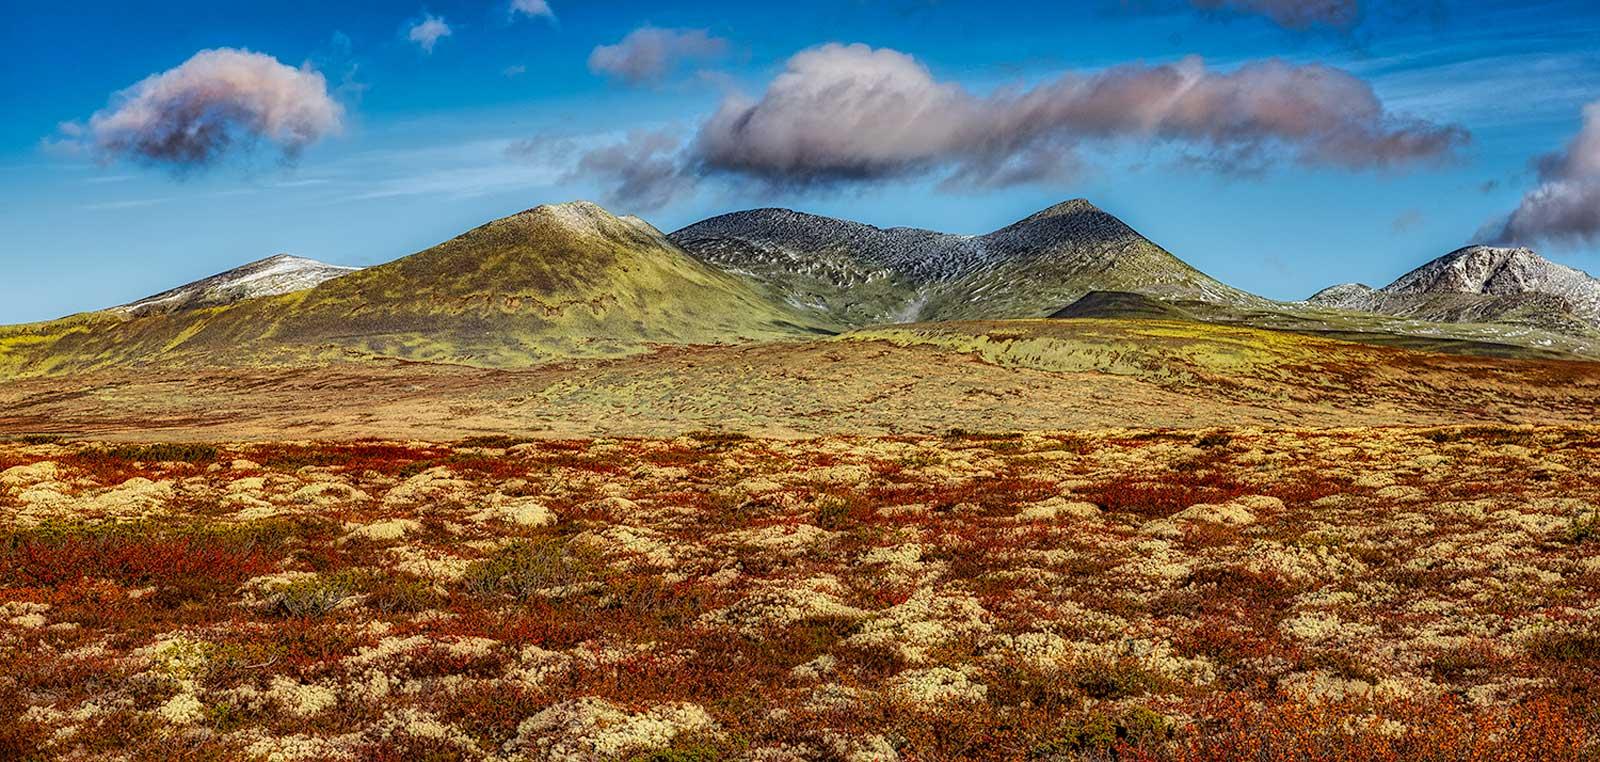 Rondane National Park